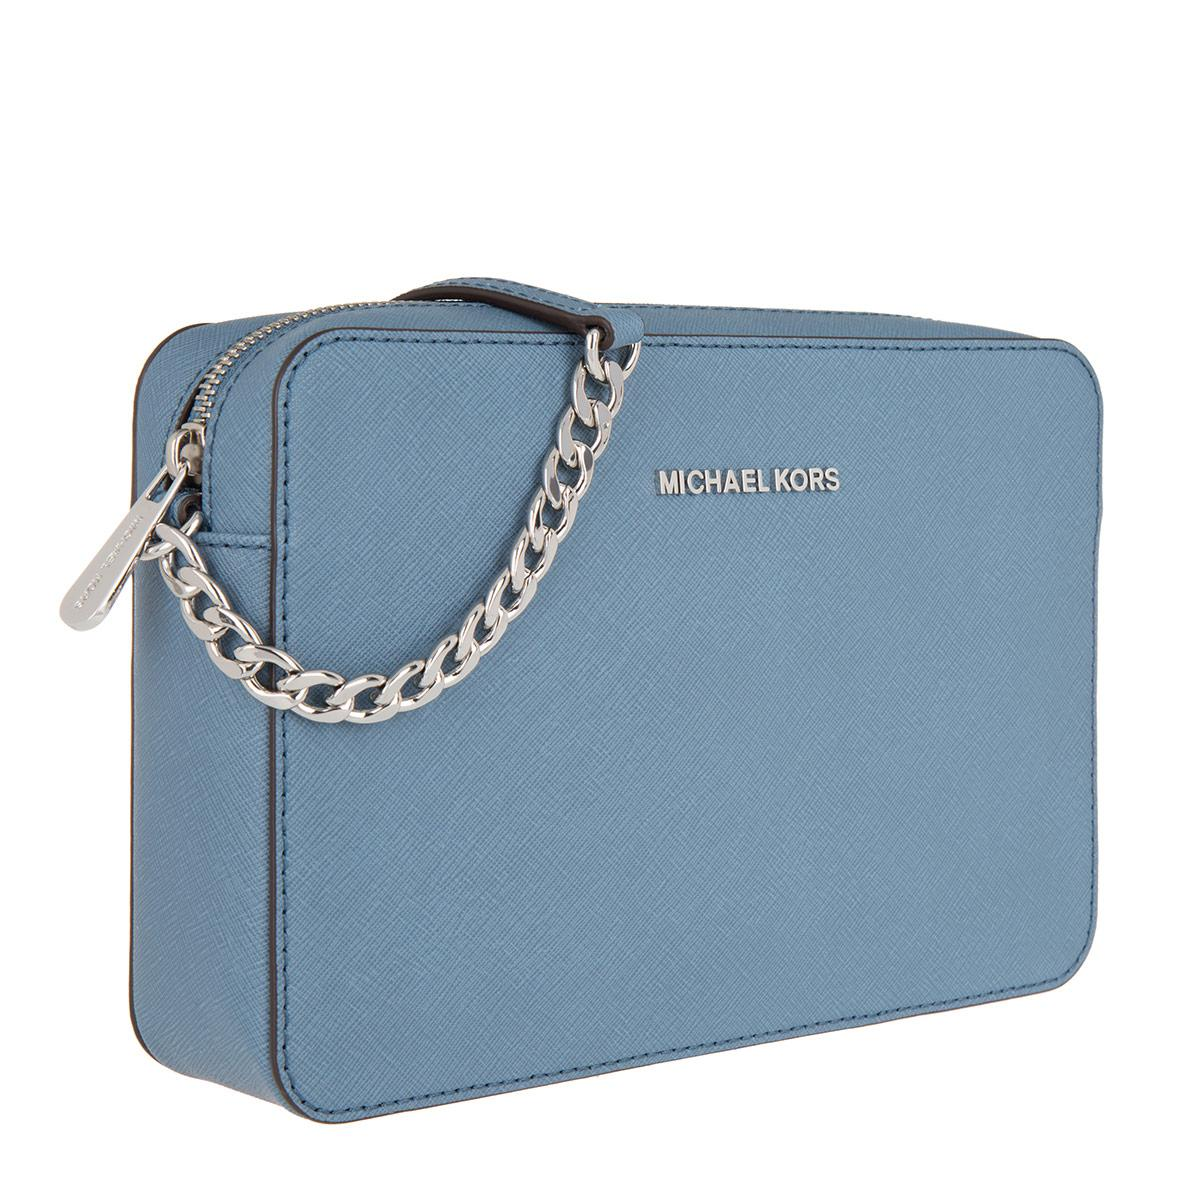 c4666043b5de Michael Kors Jet Set Travel Lg Ew Crossbody Bag Denim in Blue - Lyst